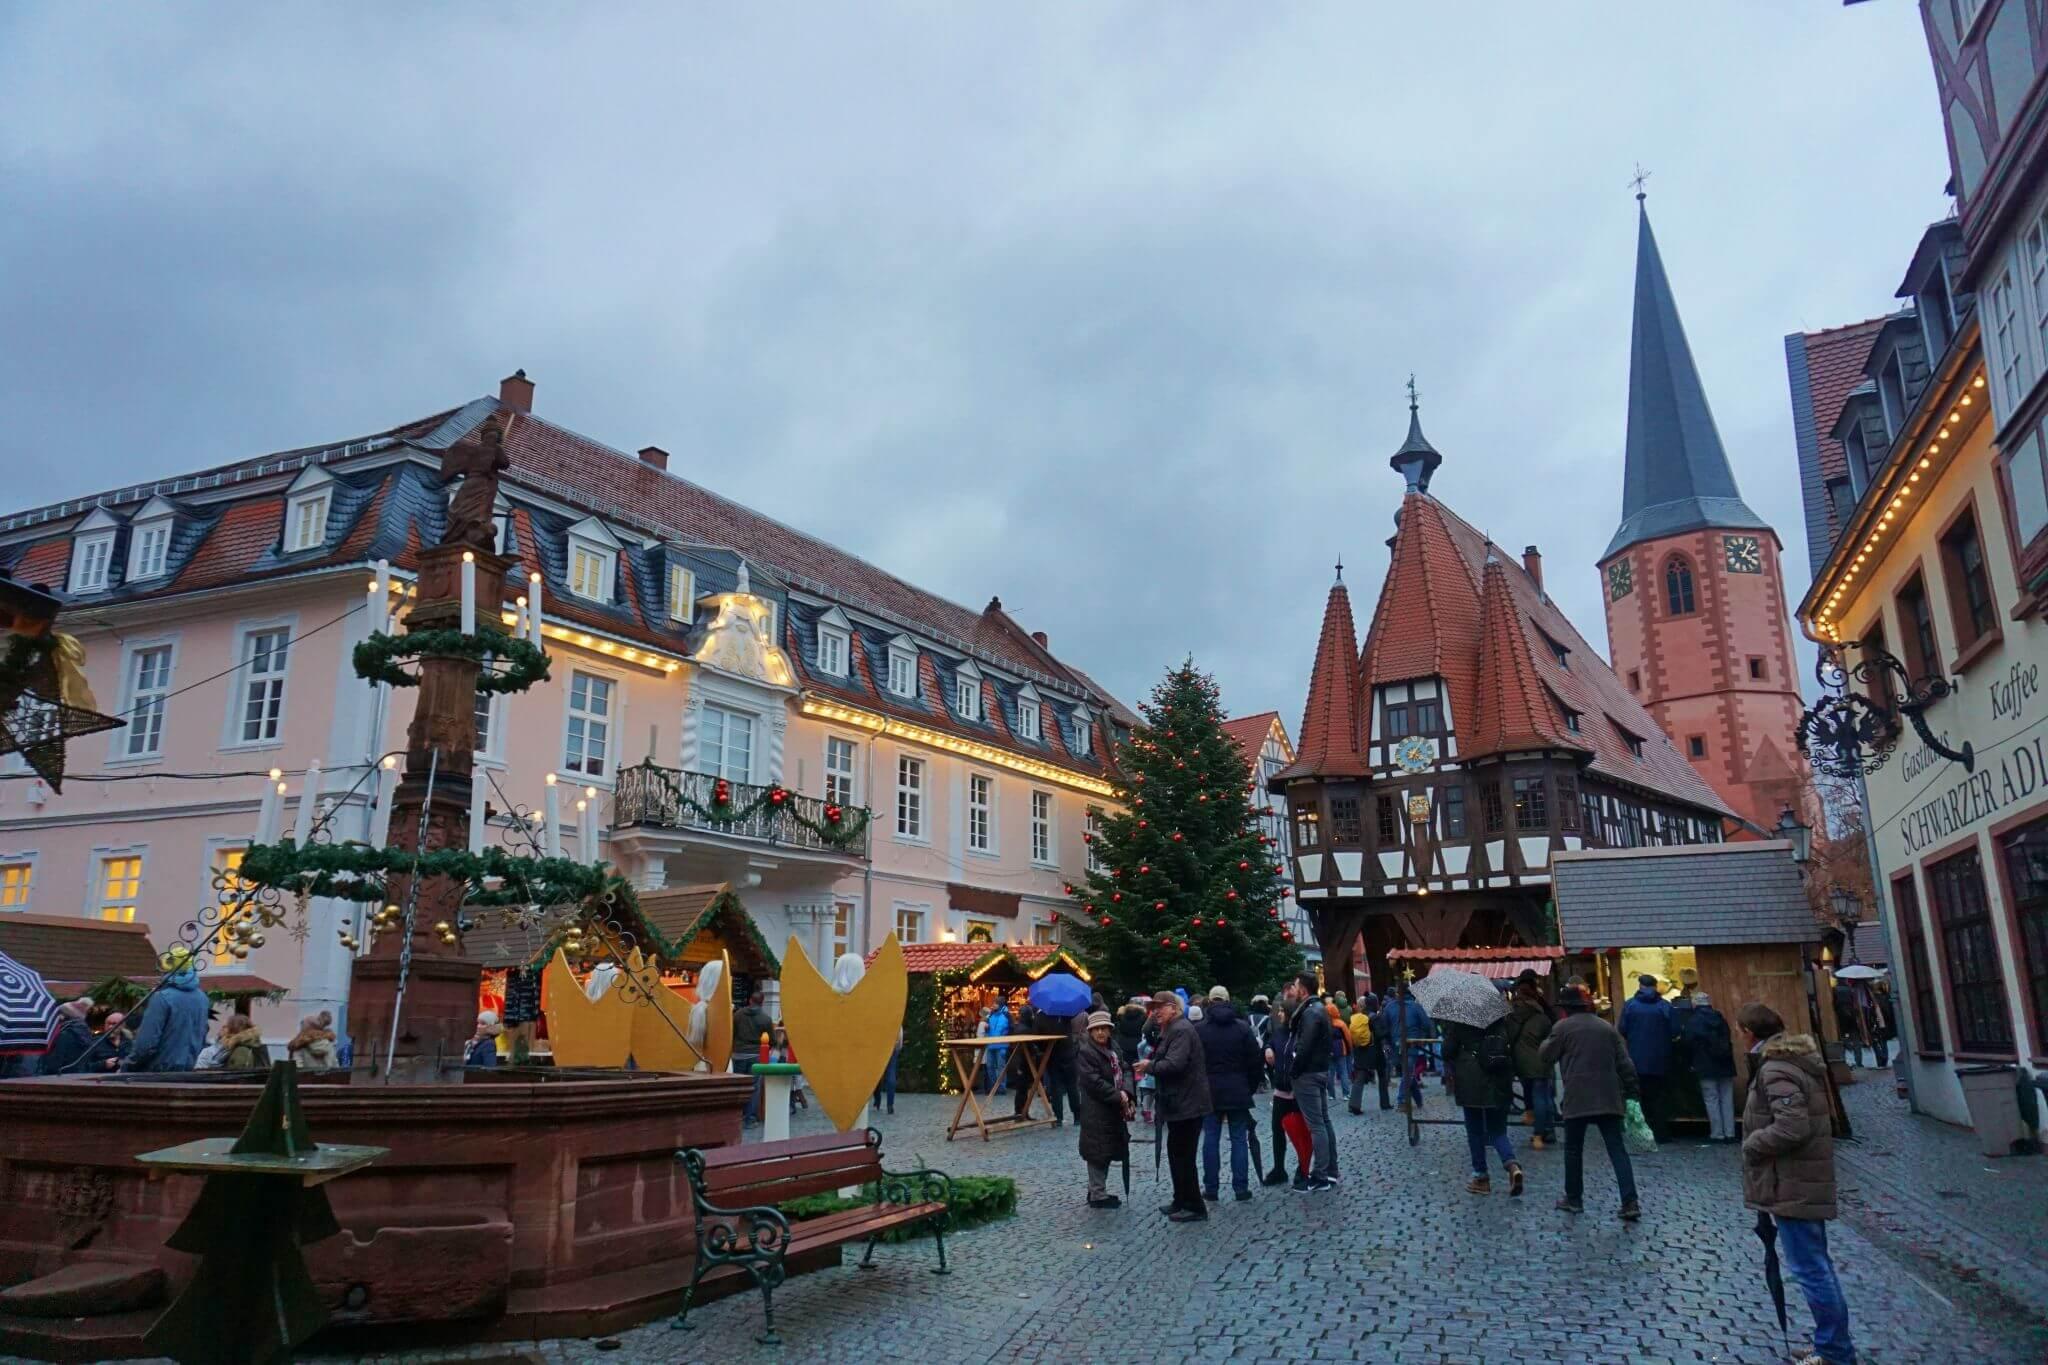 Marktplatz de Michelstädt